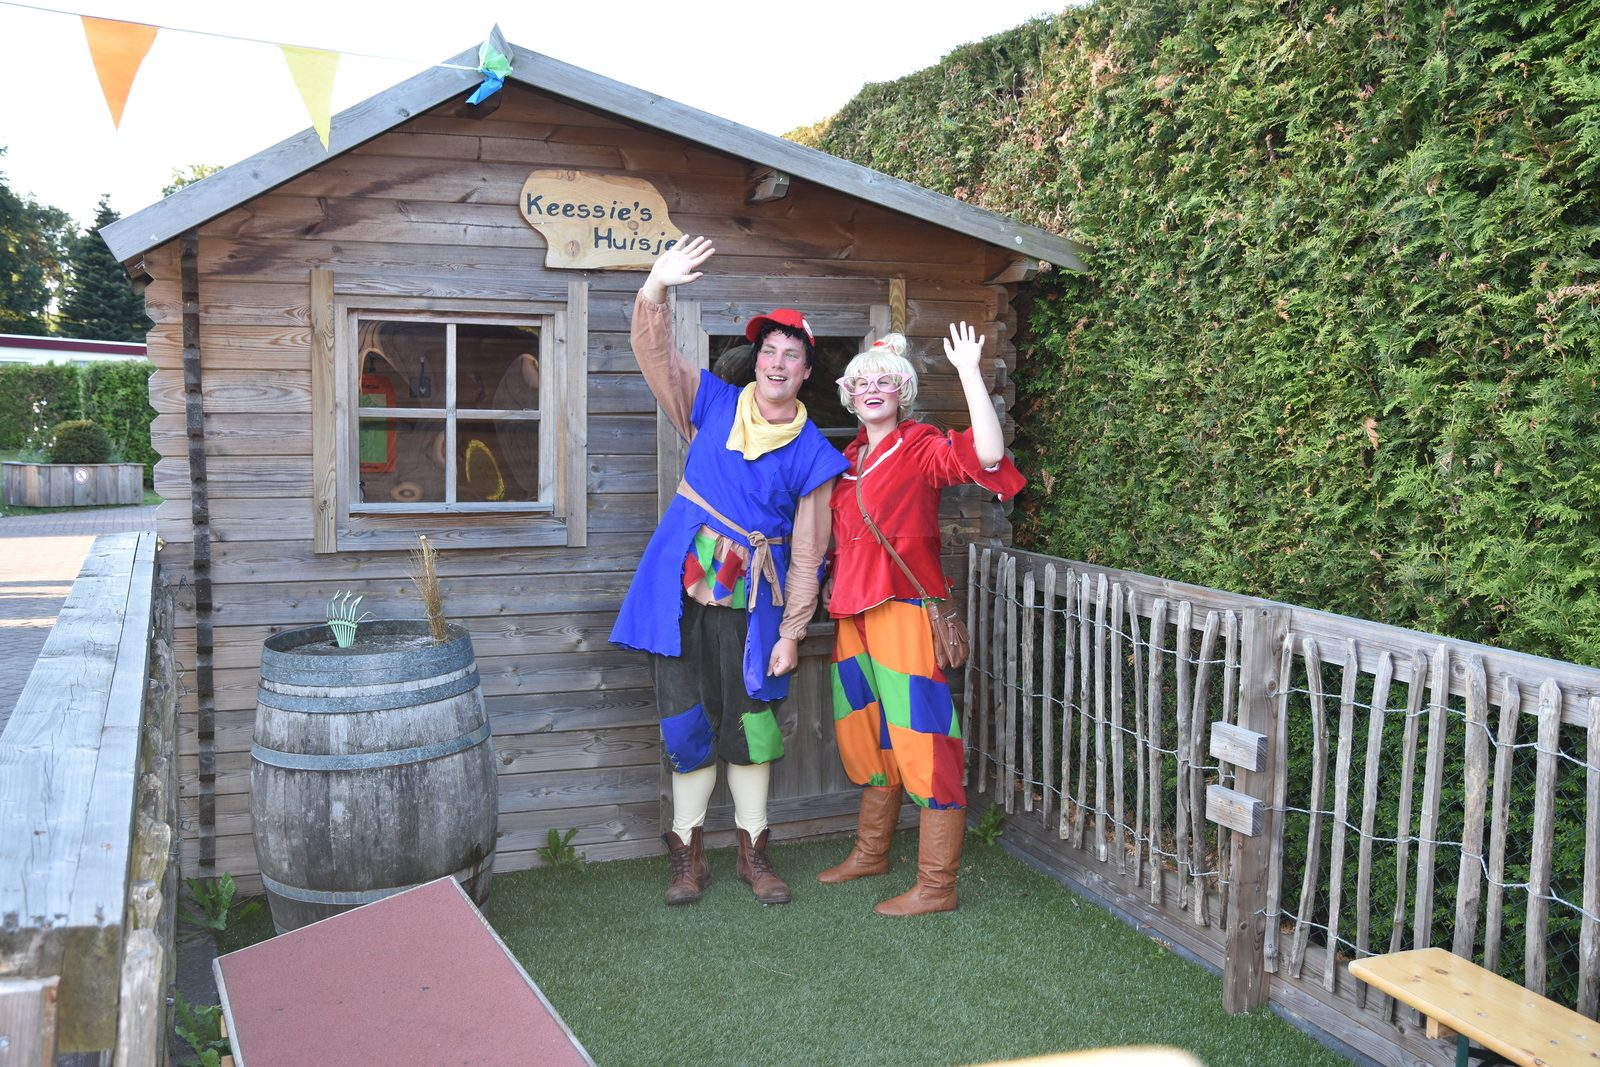 Mascots Keessie and Willie on the Veluwe | Recreation Park De Boshoek